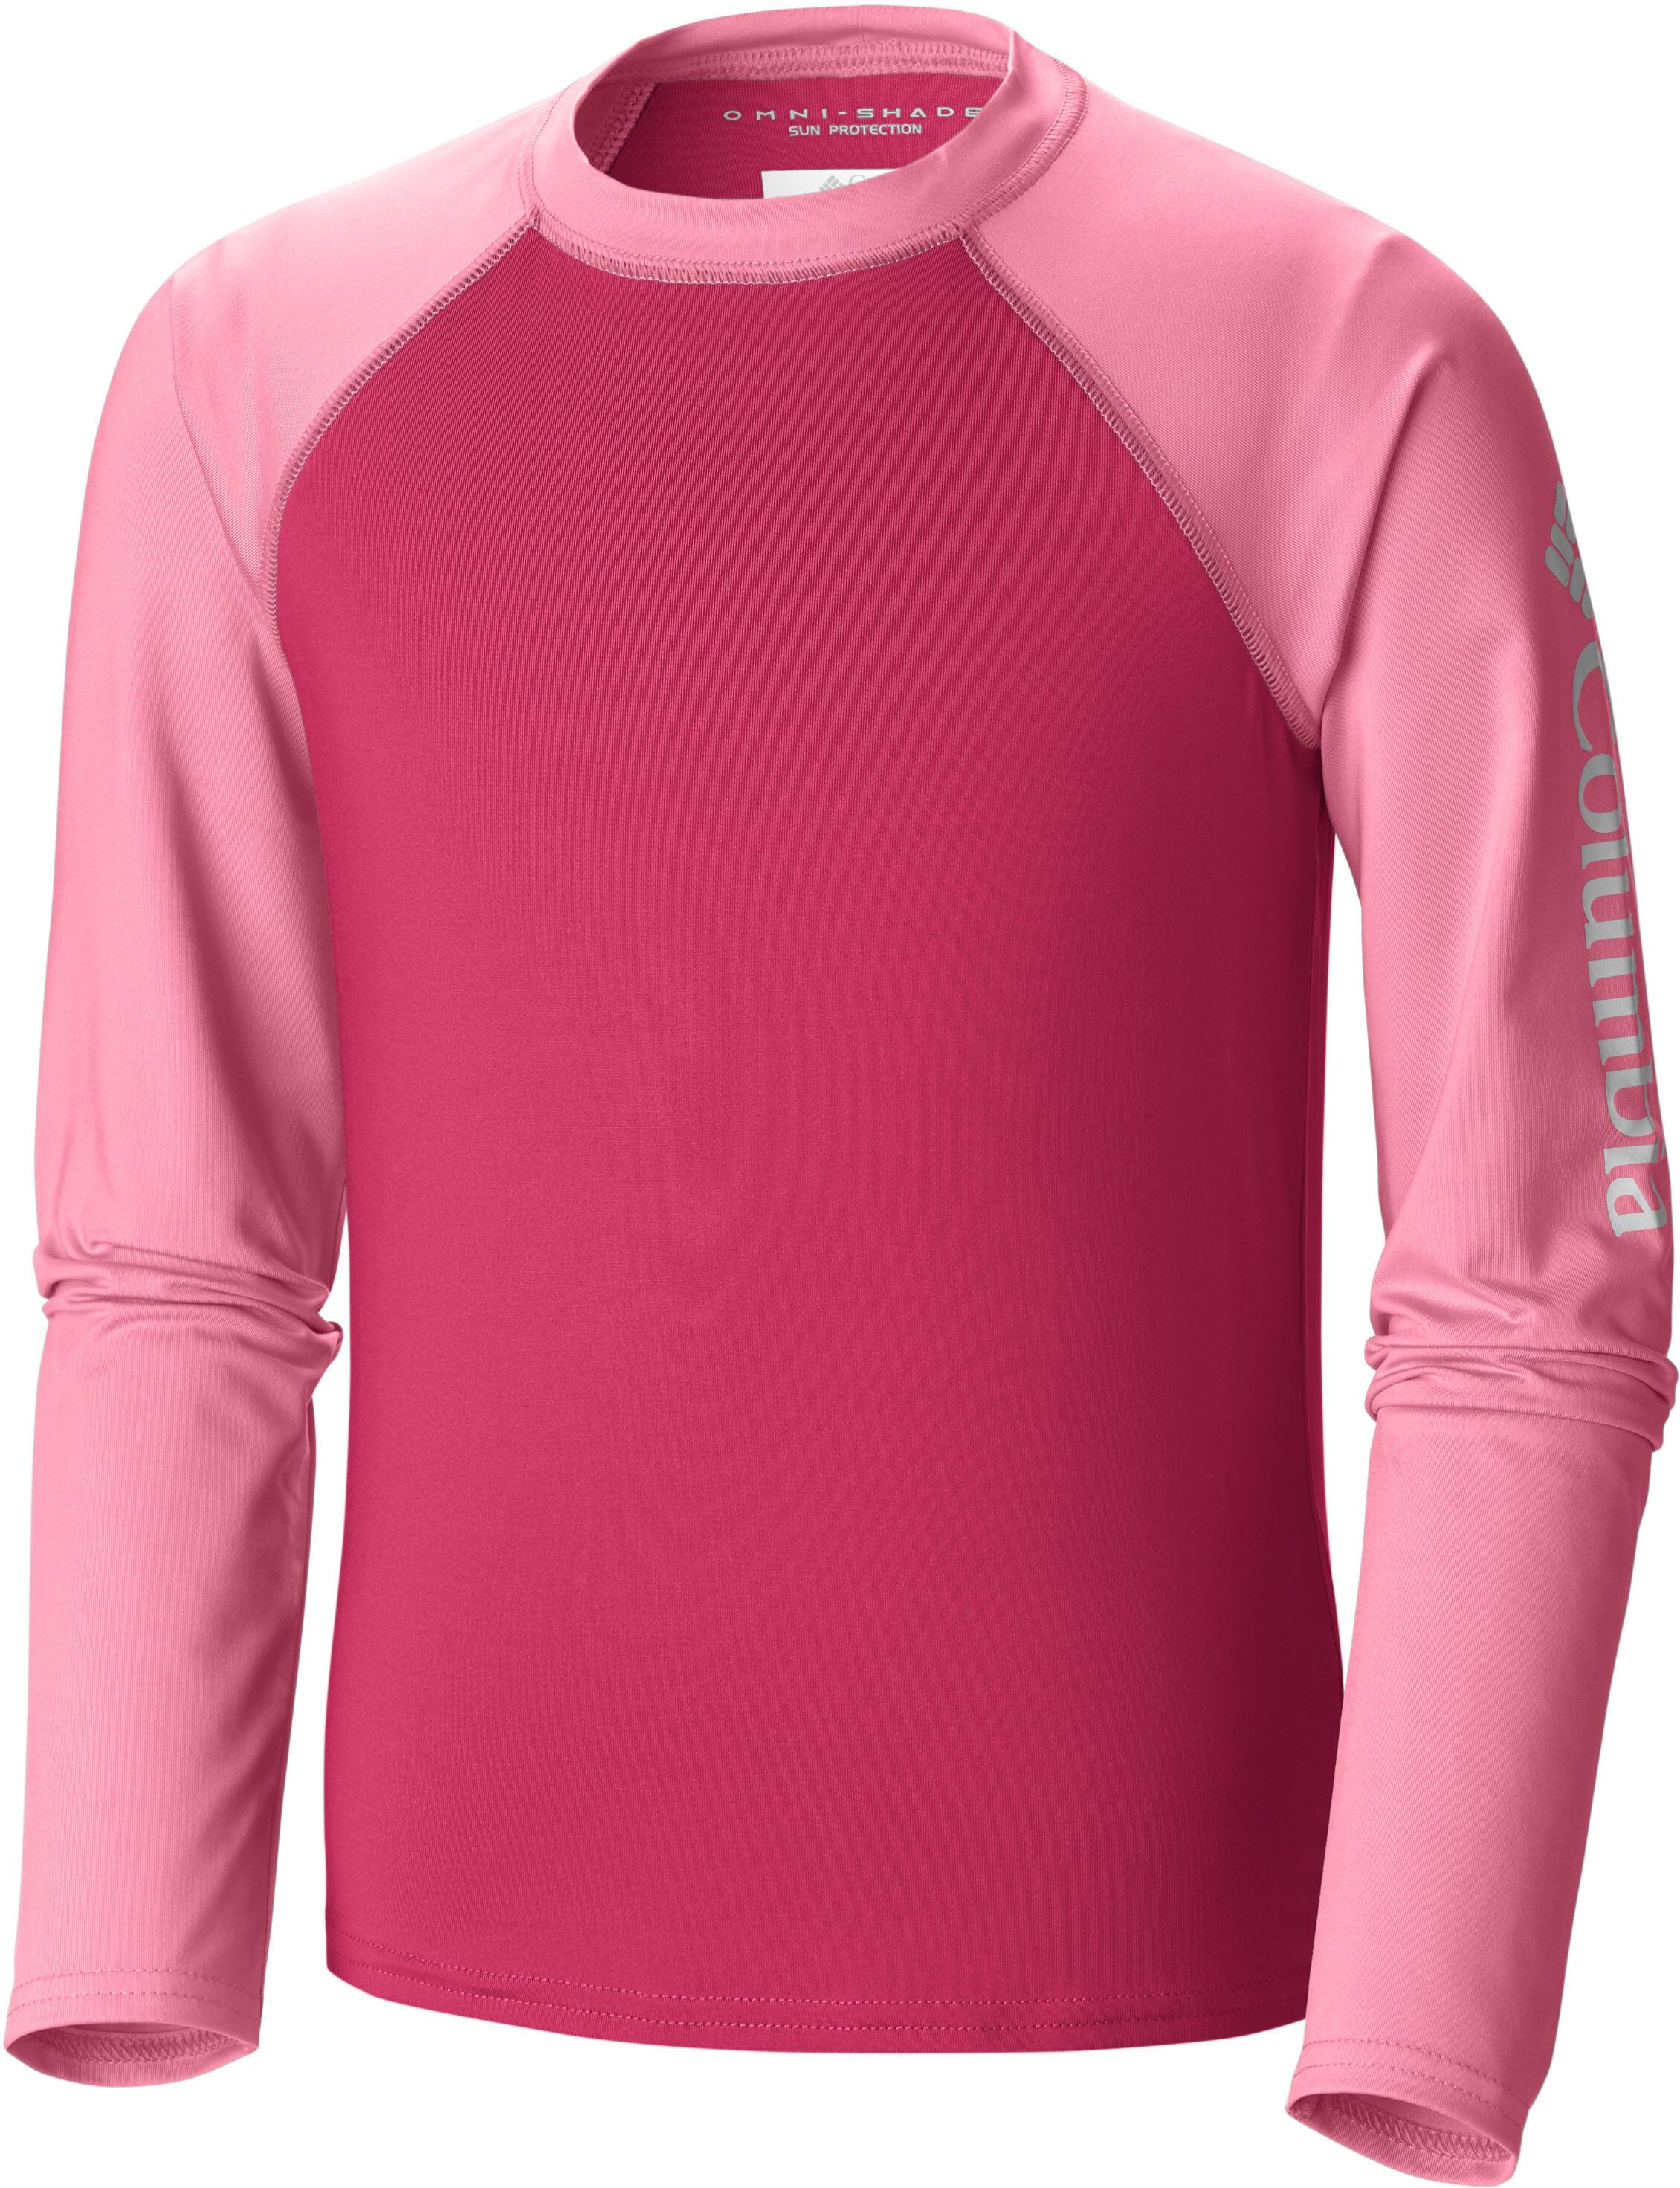 purchase cheap e9b23 5f6f4 Columbia Mini Breaker Maglietta a maniche lunghe Ragazza, punch  pink/lollipop